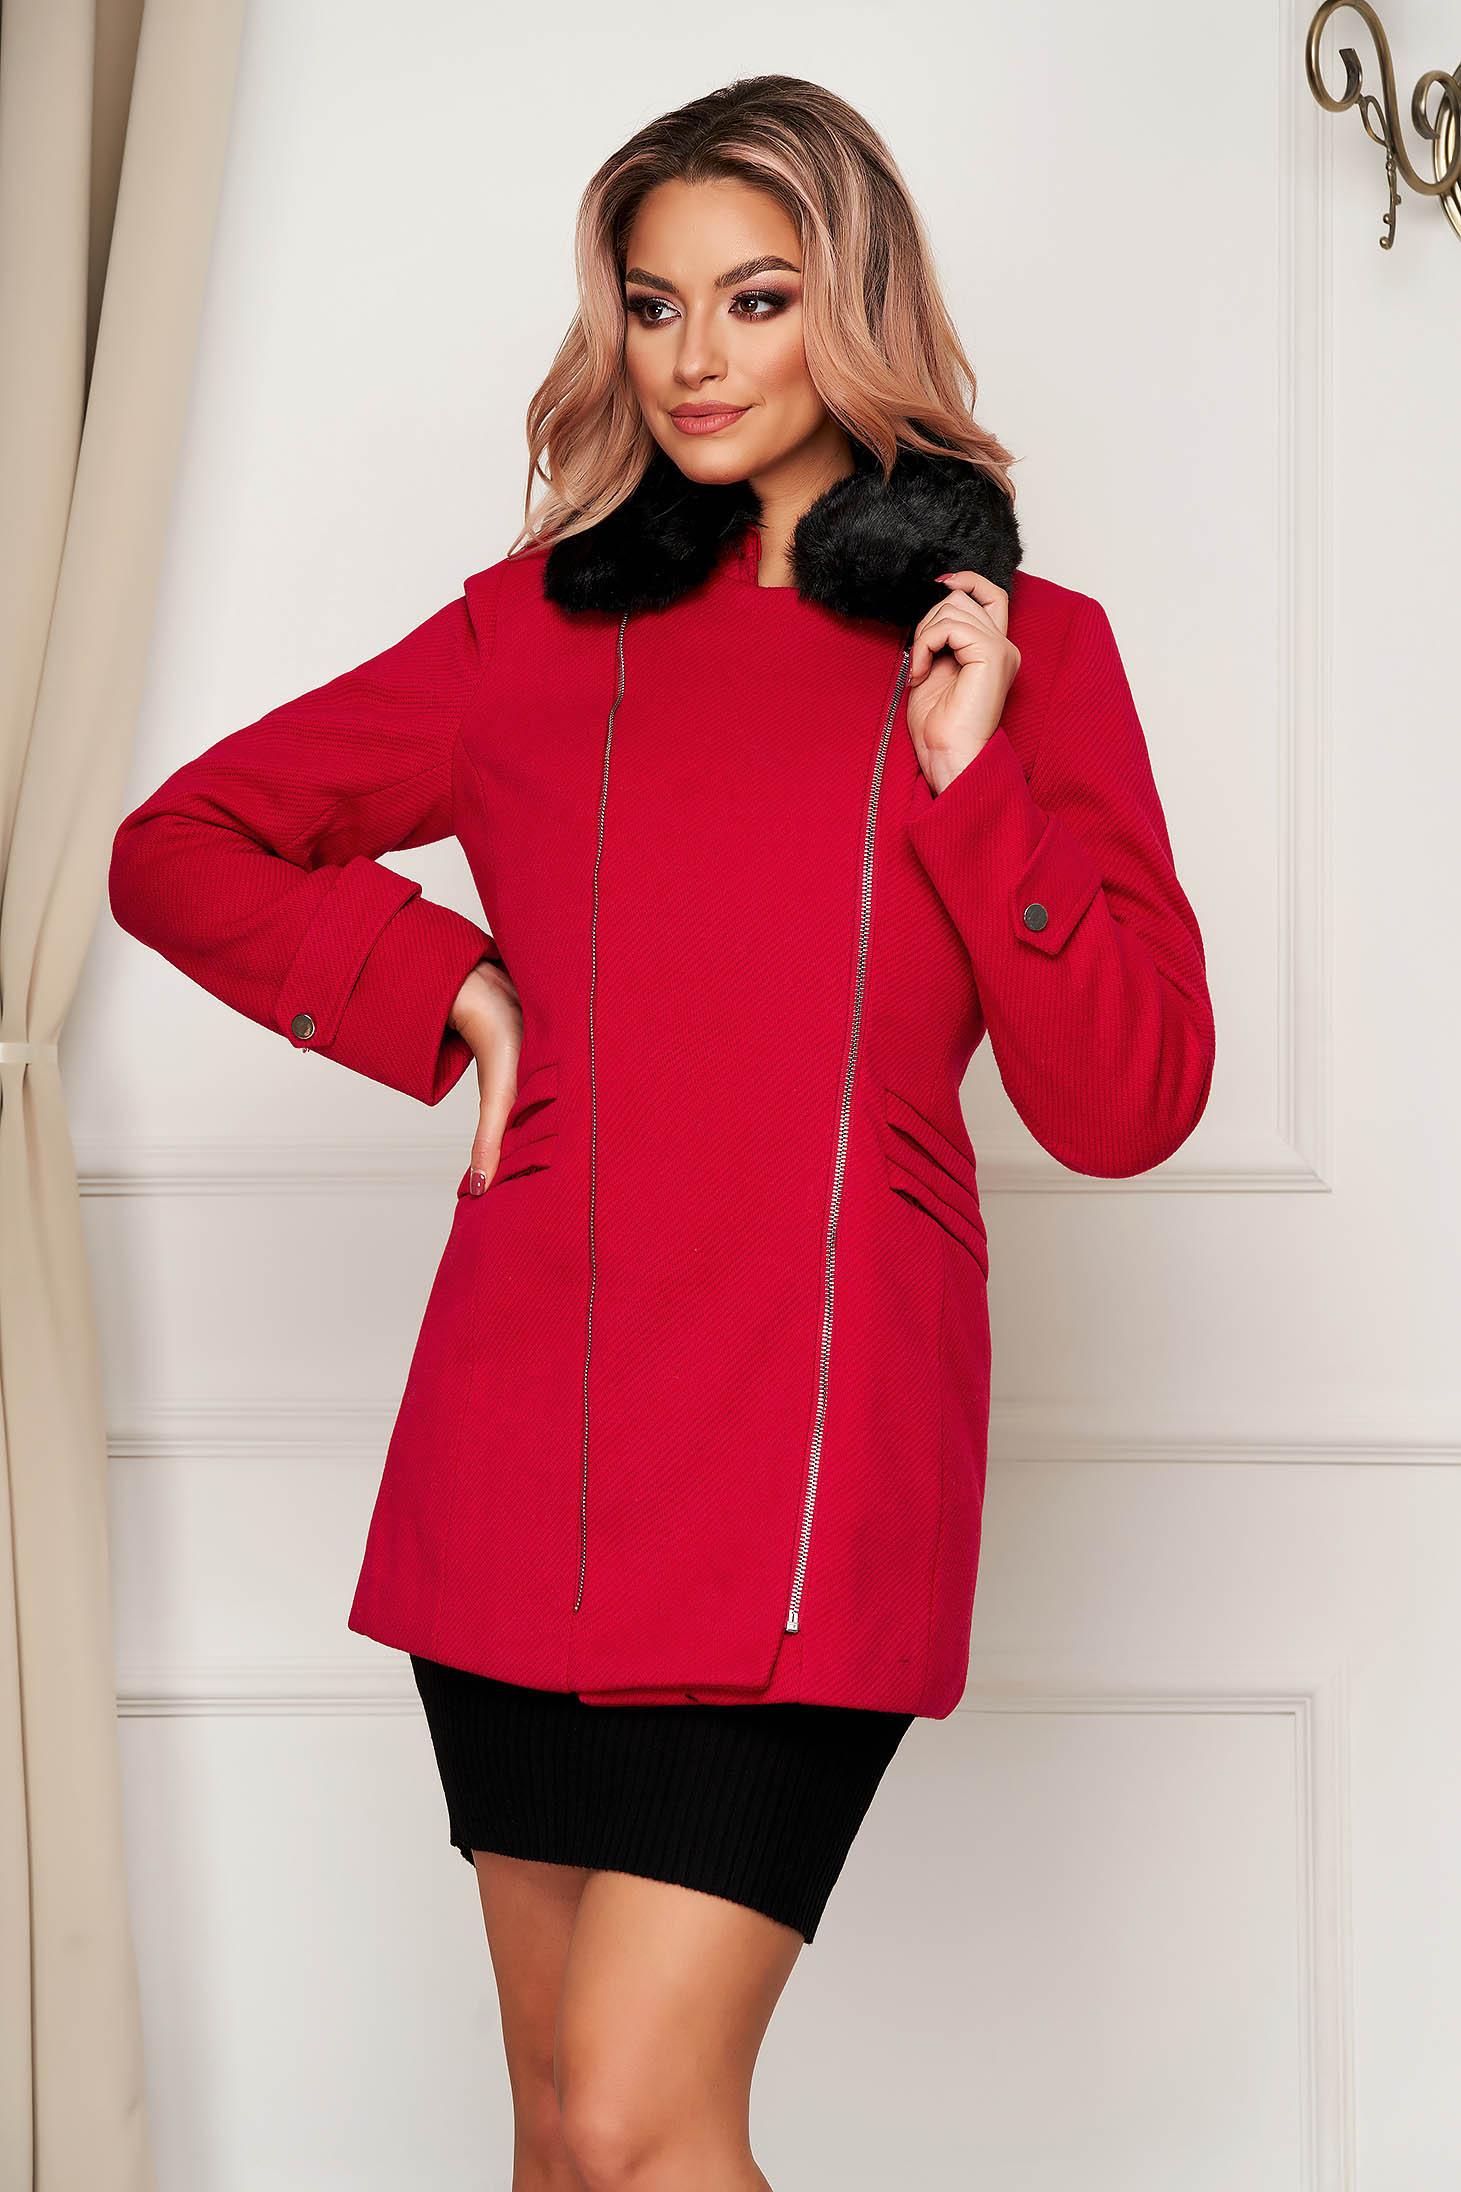 Palton SunShine rosu elegant scurt cu un croi drept din stofa accesorizat cu blana ecologica la guler